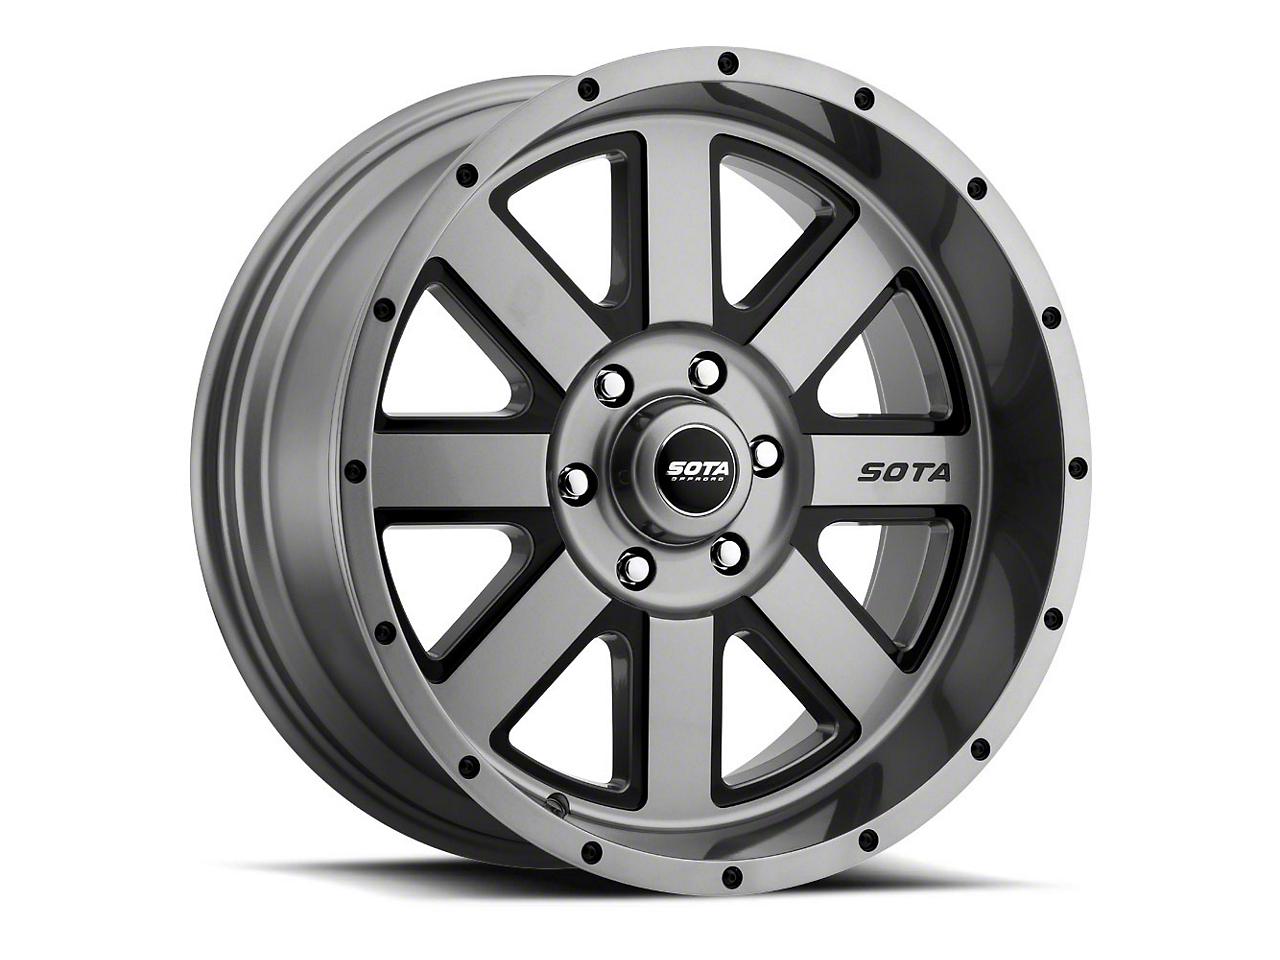 SOTA Off Road A.W.O.L. Anthra-Kote Black Wheels (07-18 Jeep Wrangler JK; 2018 Jeep Wrangler JL)